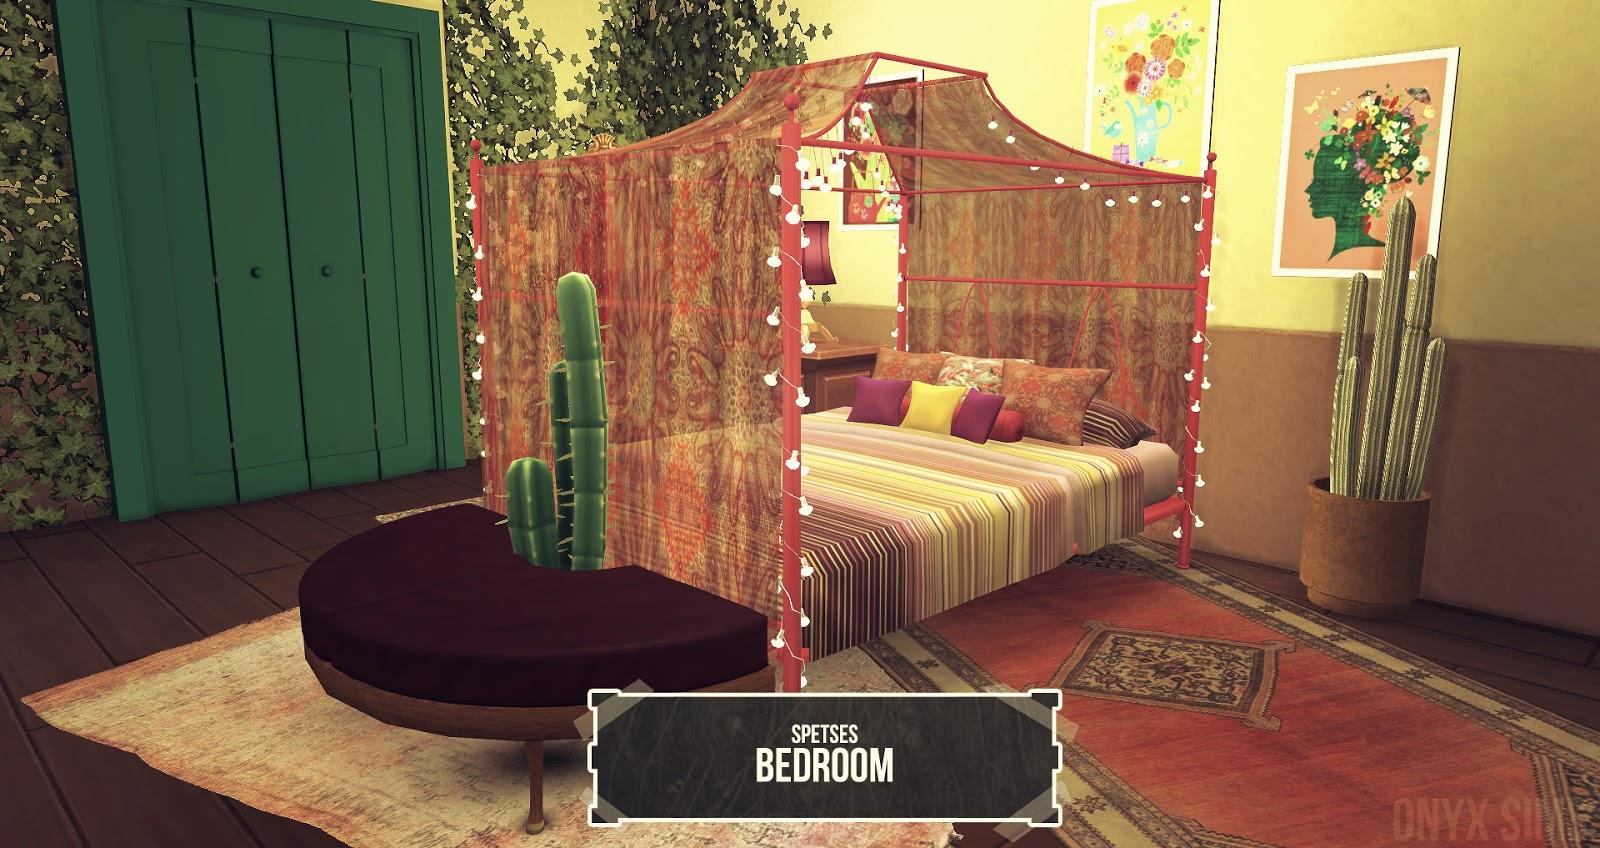 Spetses Bedroom Set Onyx Sims